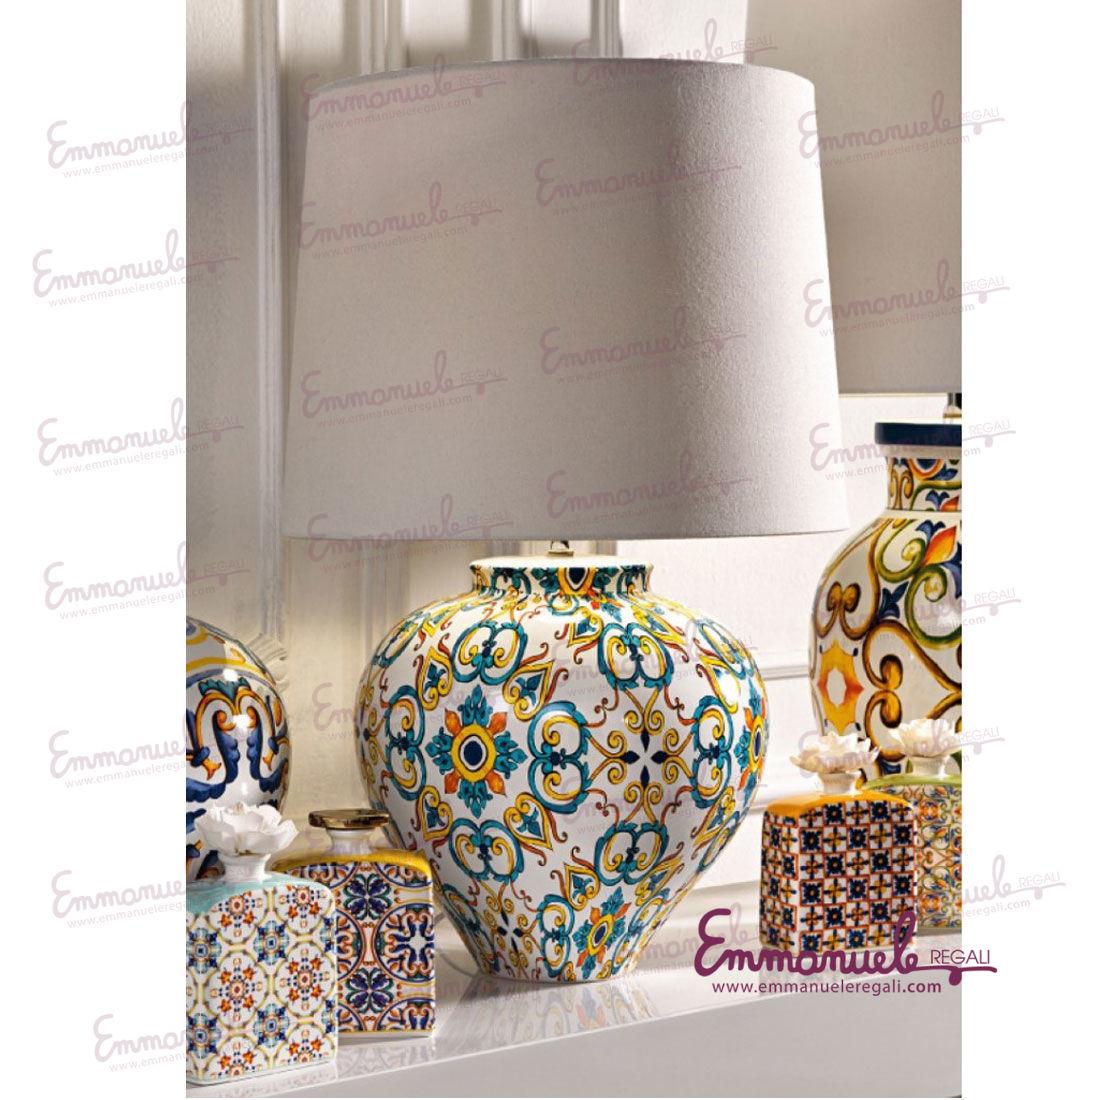 Lampada Medicea Stonewear - Brandani-emmanueleregali-bombonieraperfetta